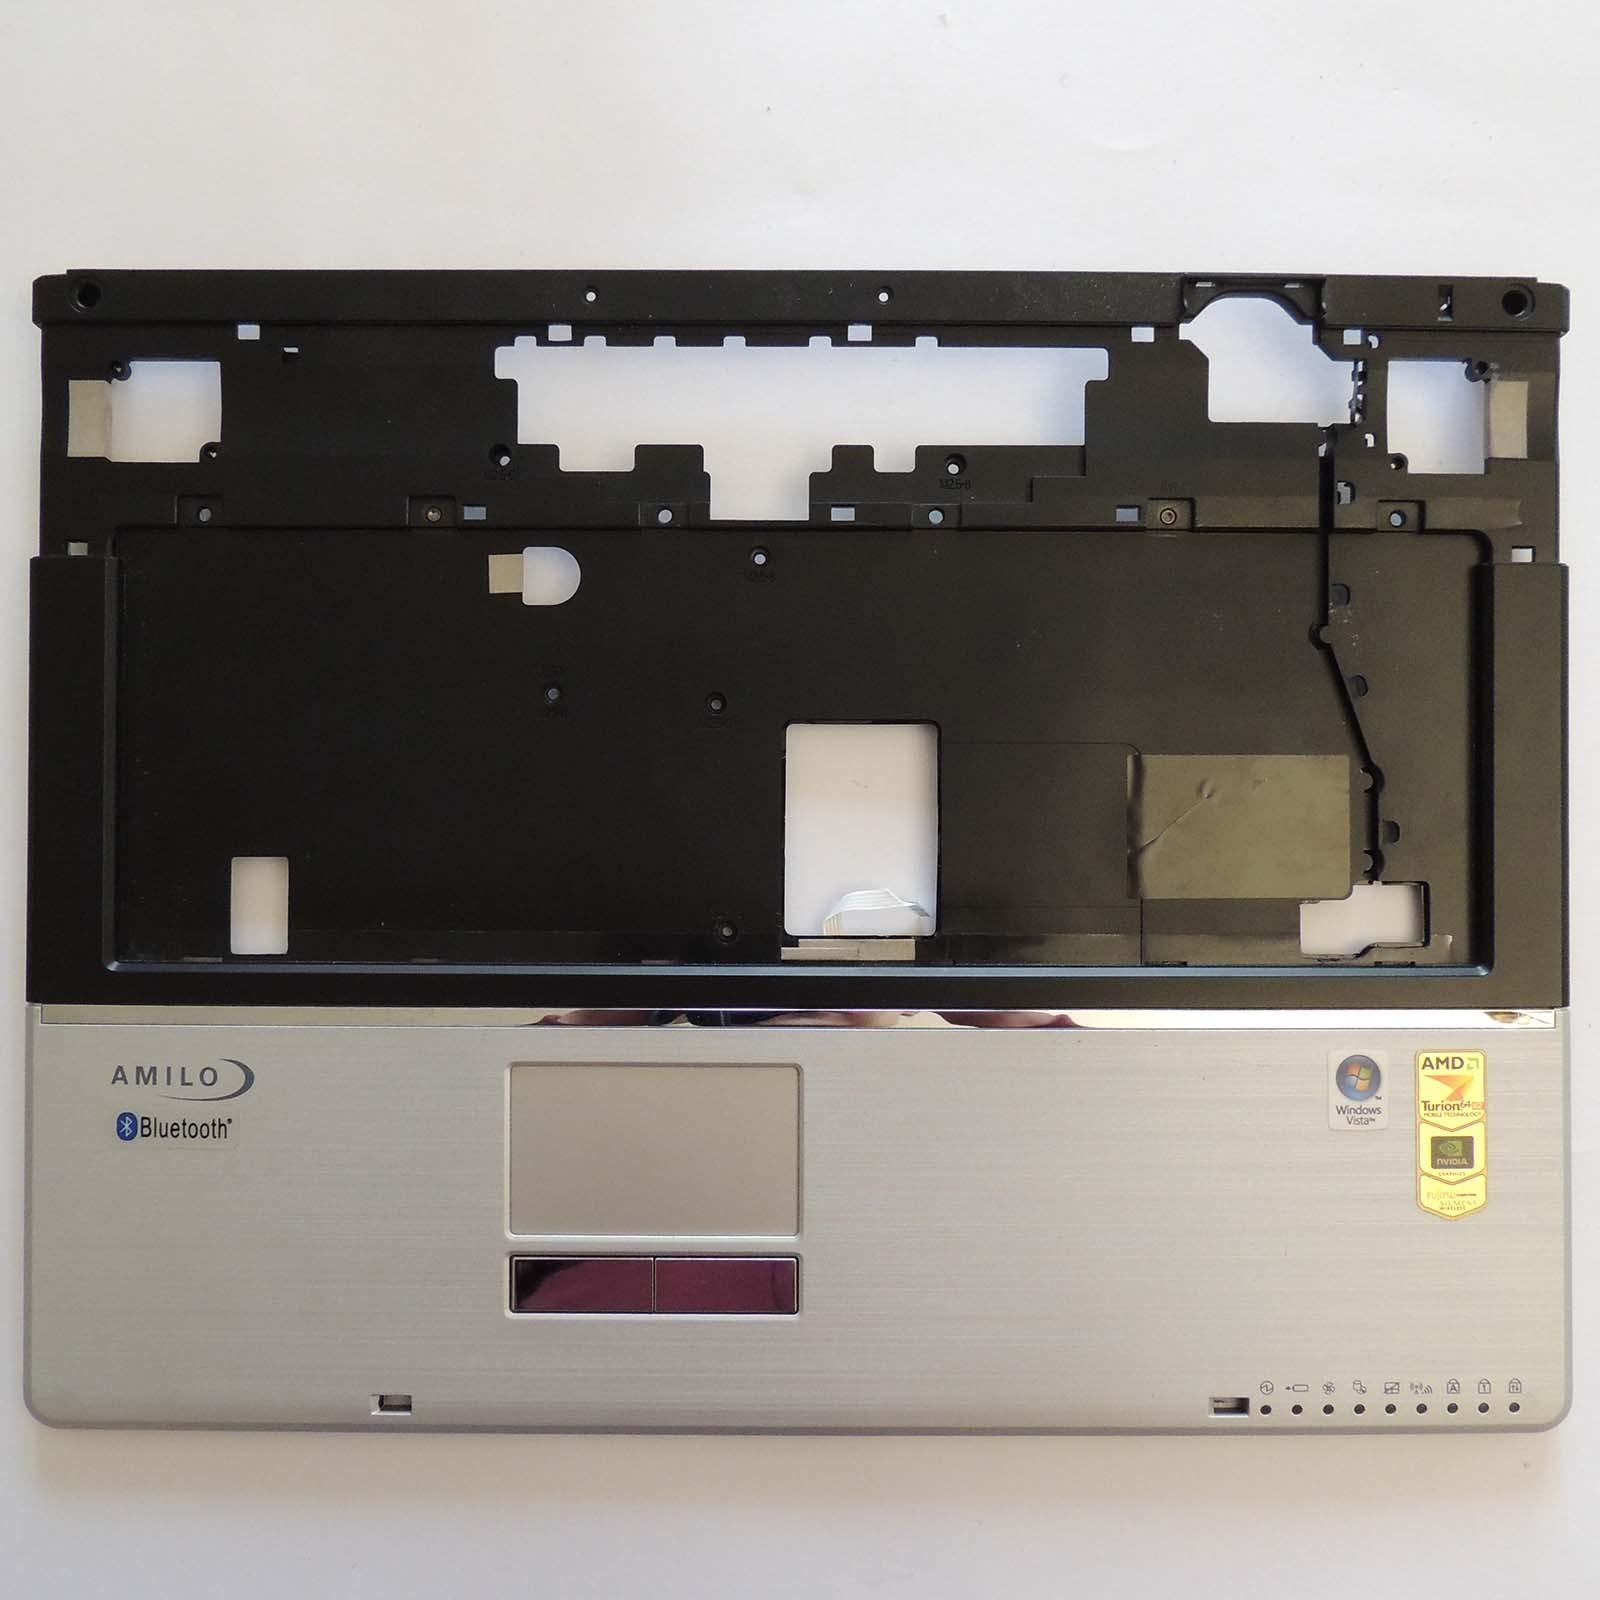 Scocca Touchpad Amilo XA2558 fujitsu siemens 24-46511-01, 80-50367-00